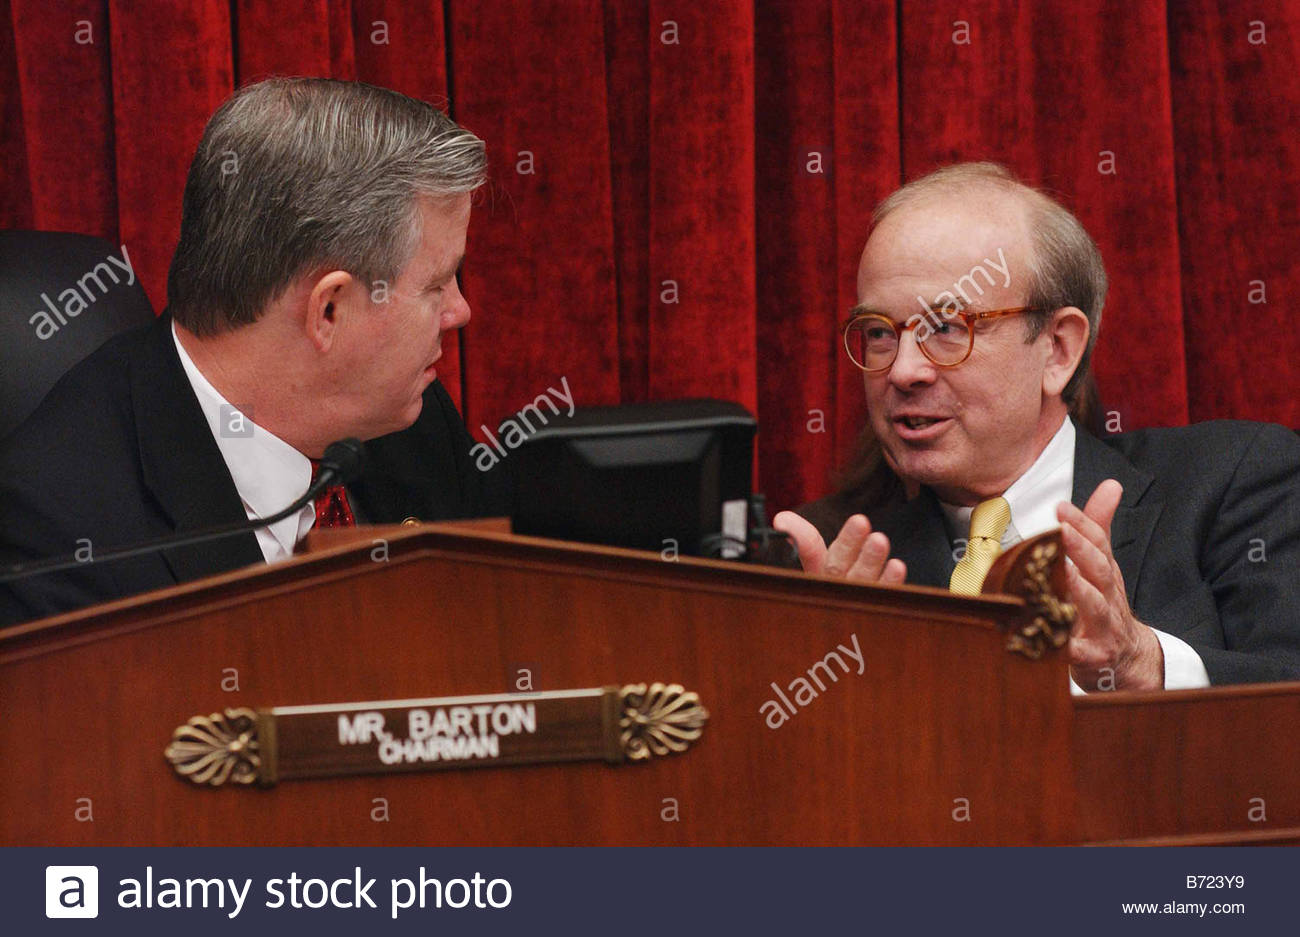 Superb 3 19 03 OMNIBUS ENERGY LEGISLATION House Energy Subommittee On Energy And  Air Quality Chairman Joe L Barton R Texas And Ranking